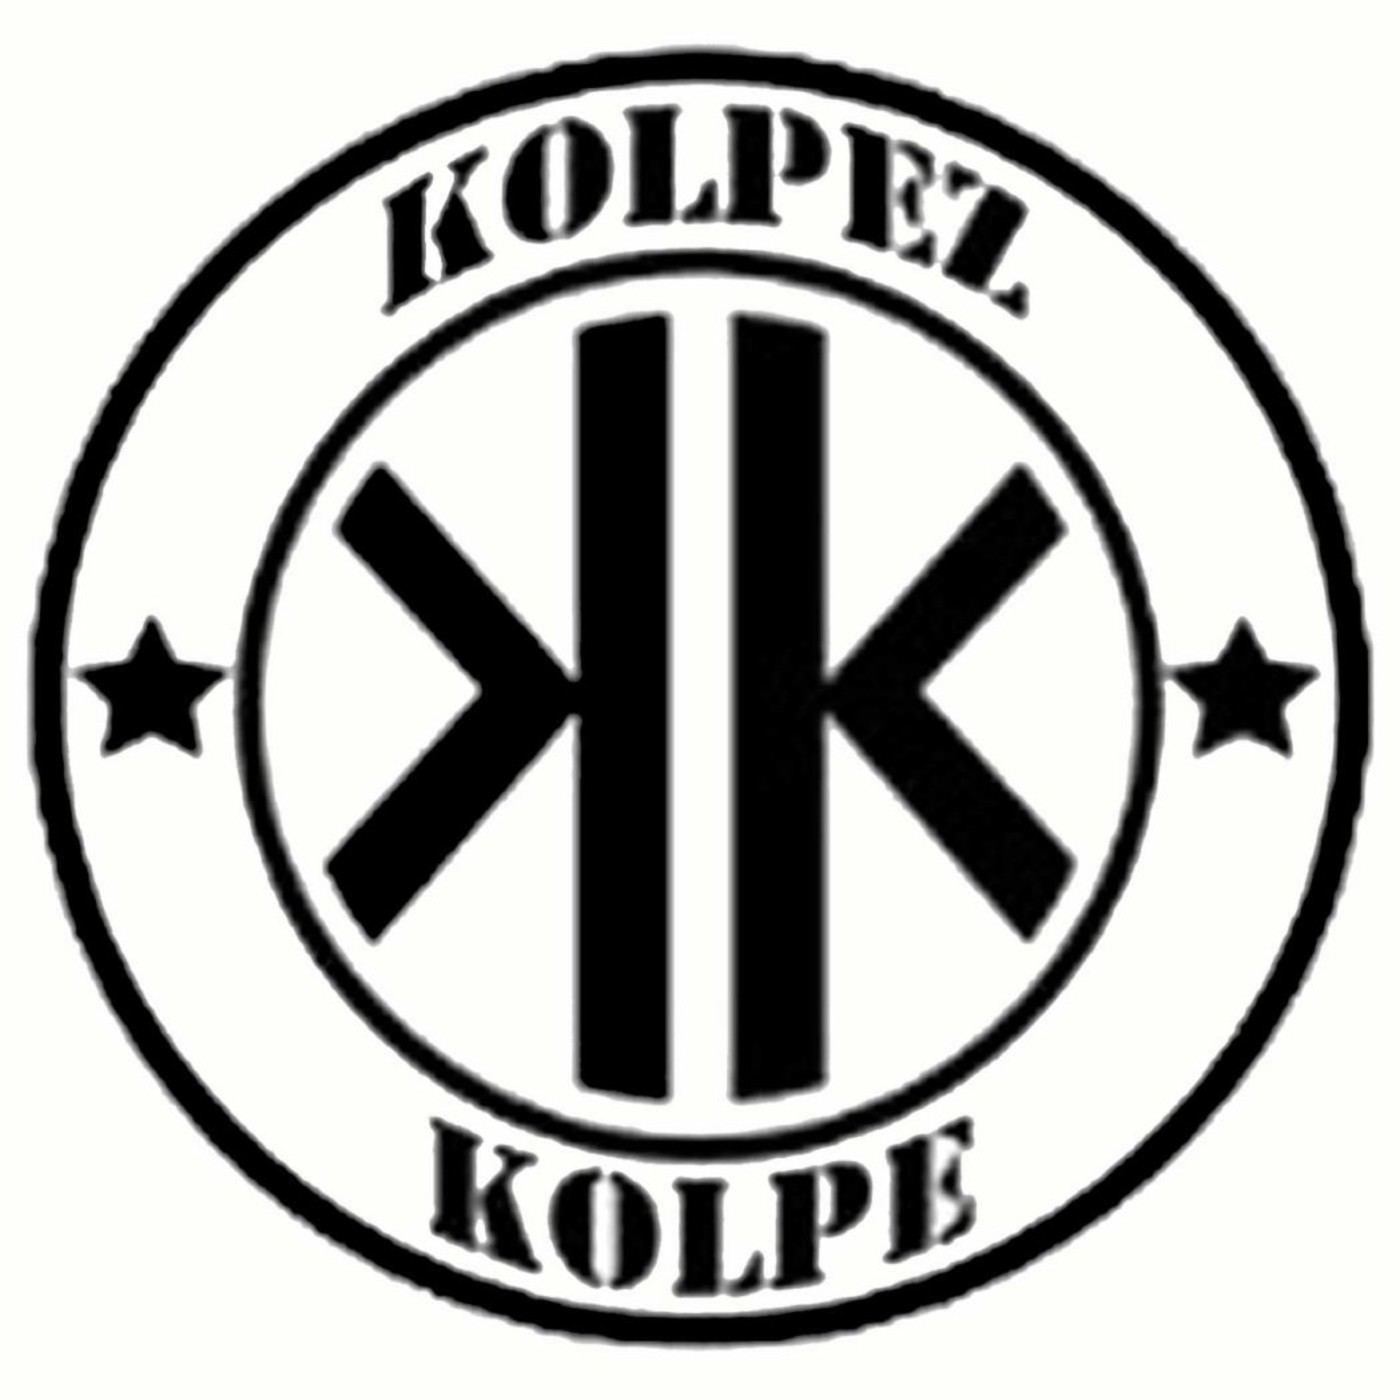 5X137 Kolpez Kolpe – El Sonido de la Metralla